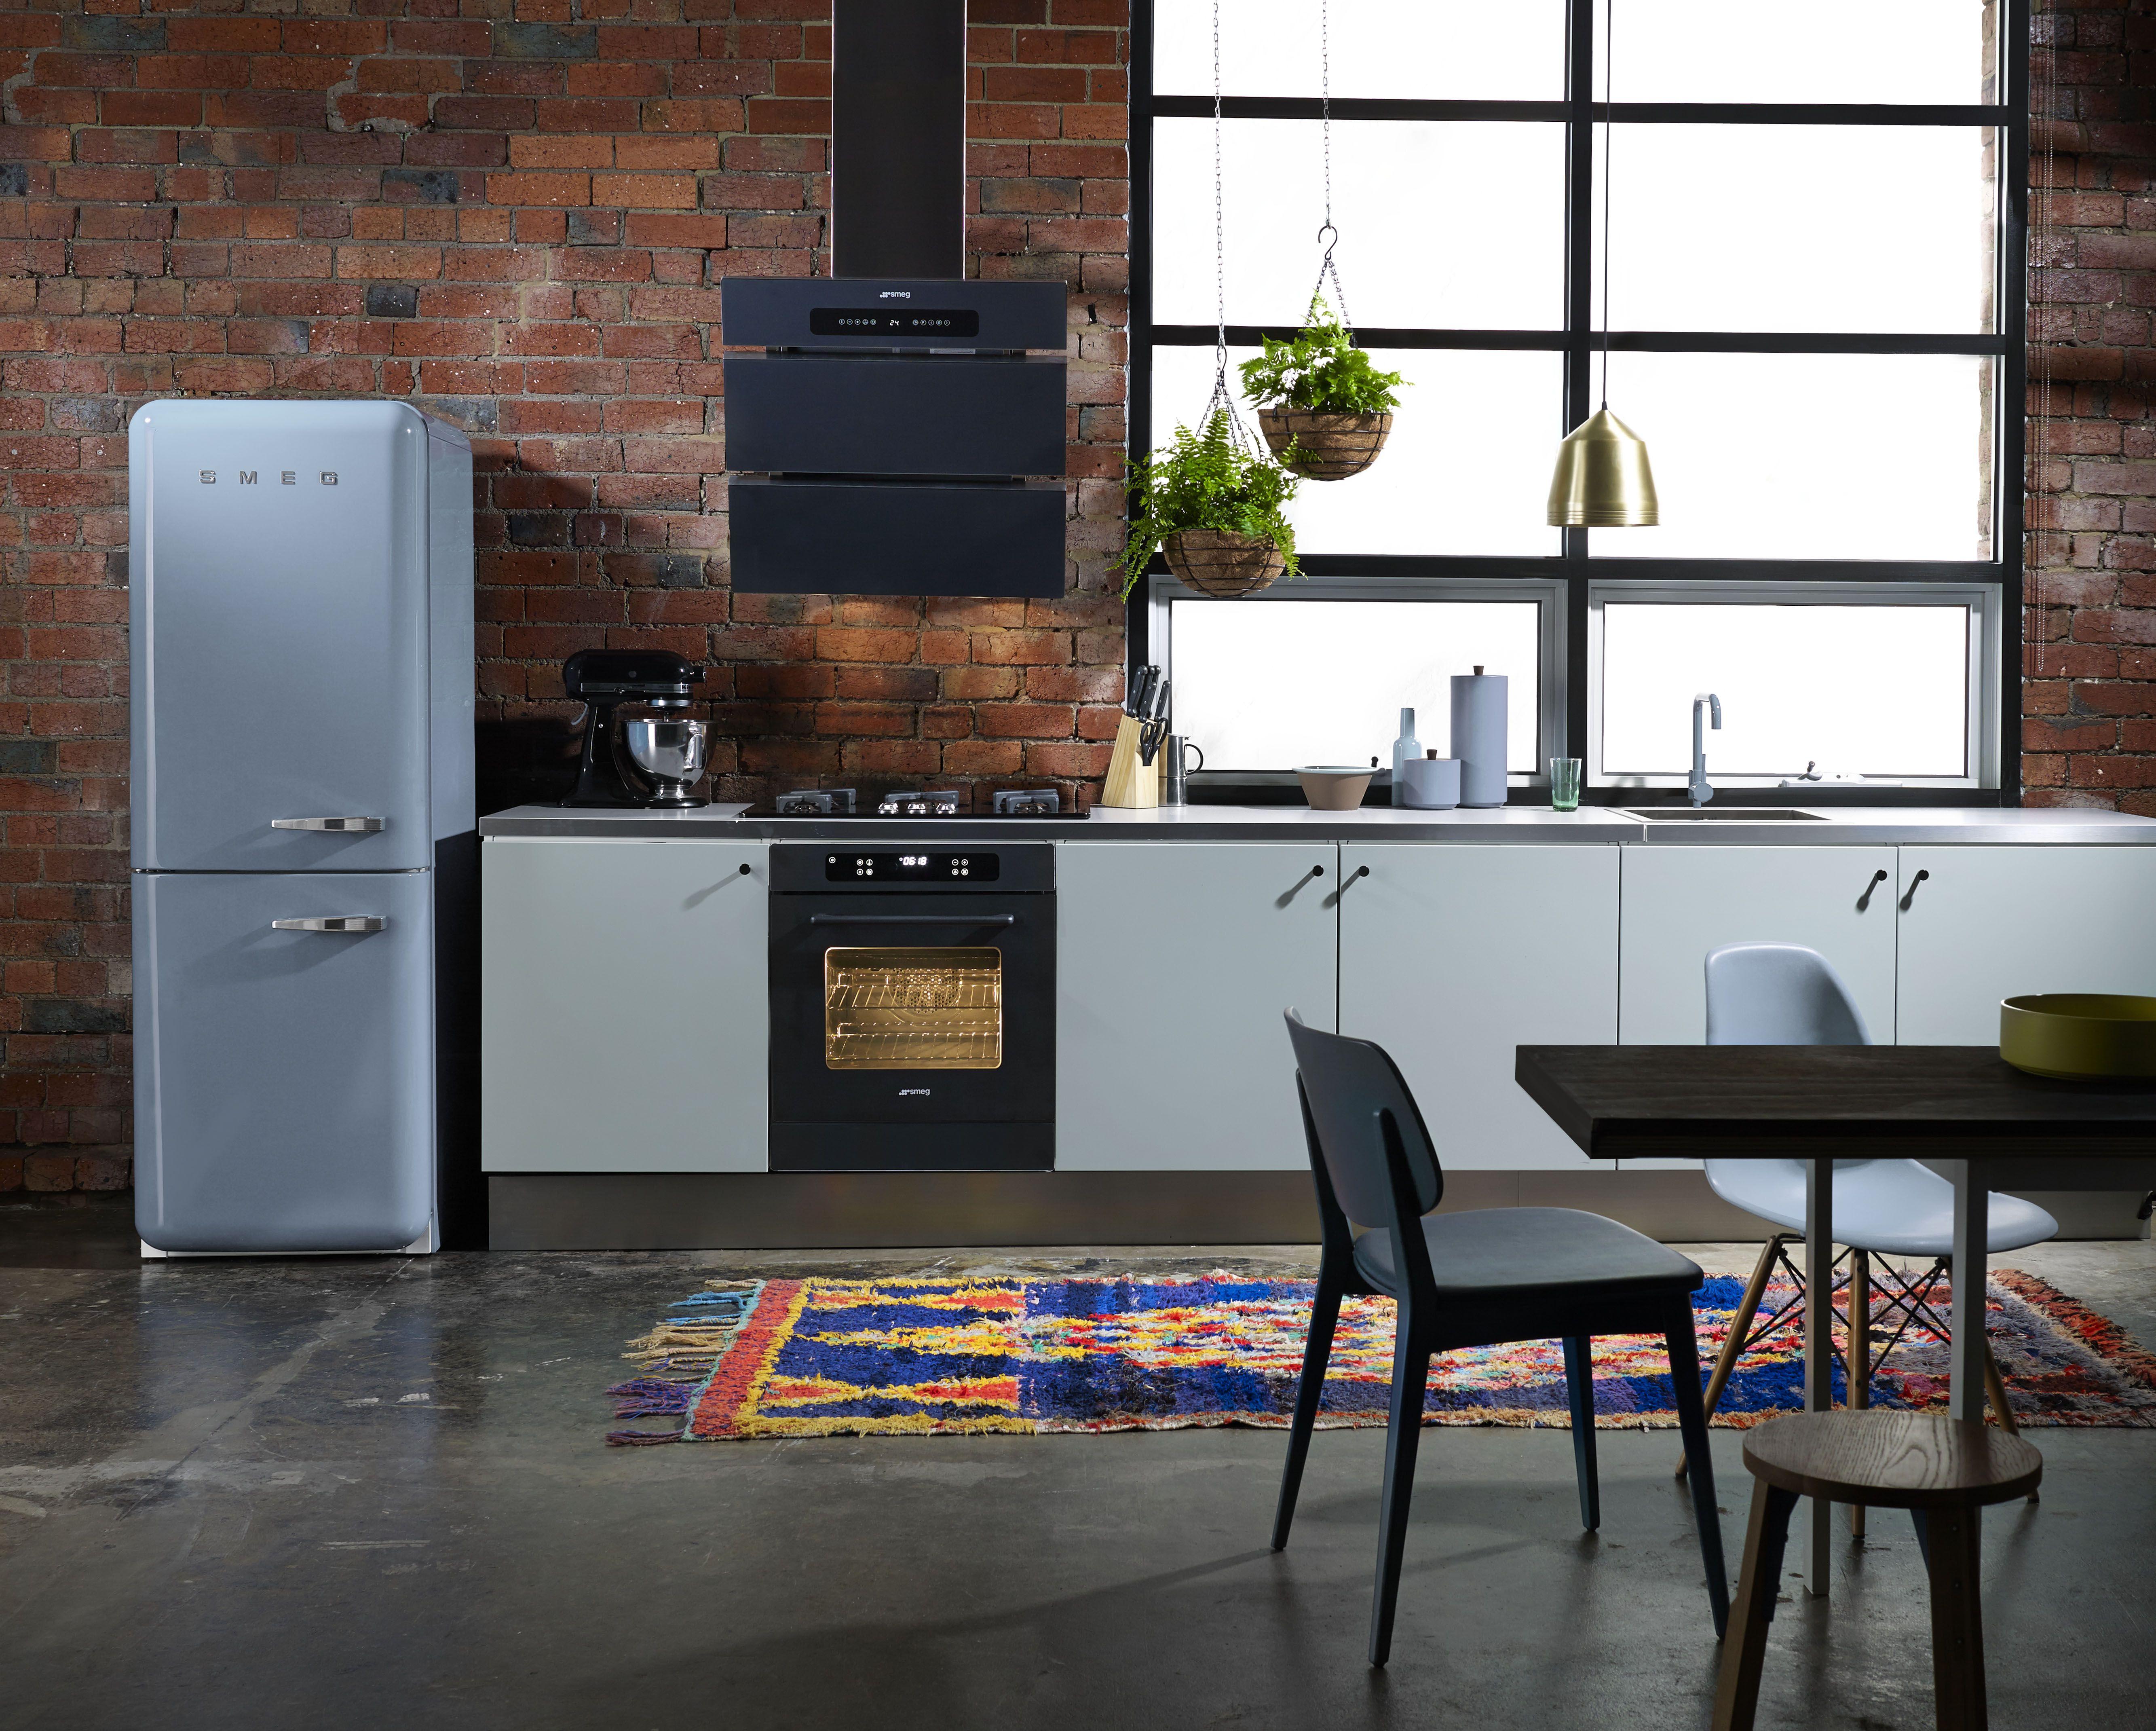 The FAB32RFA fridge-freezer shown here in pastel blue. It is ...